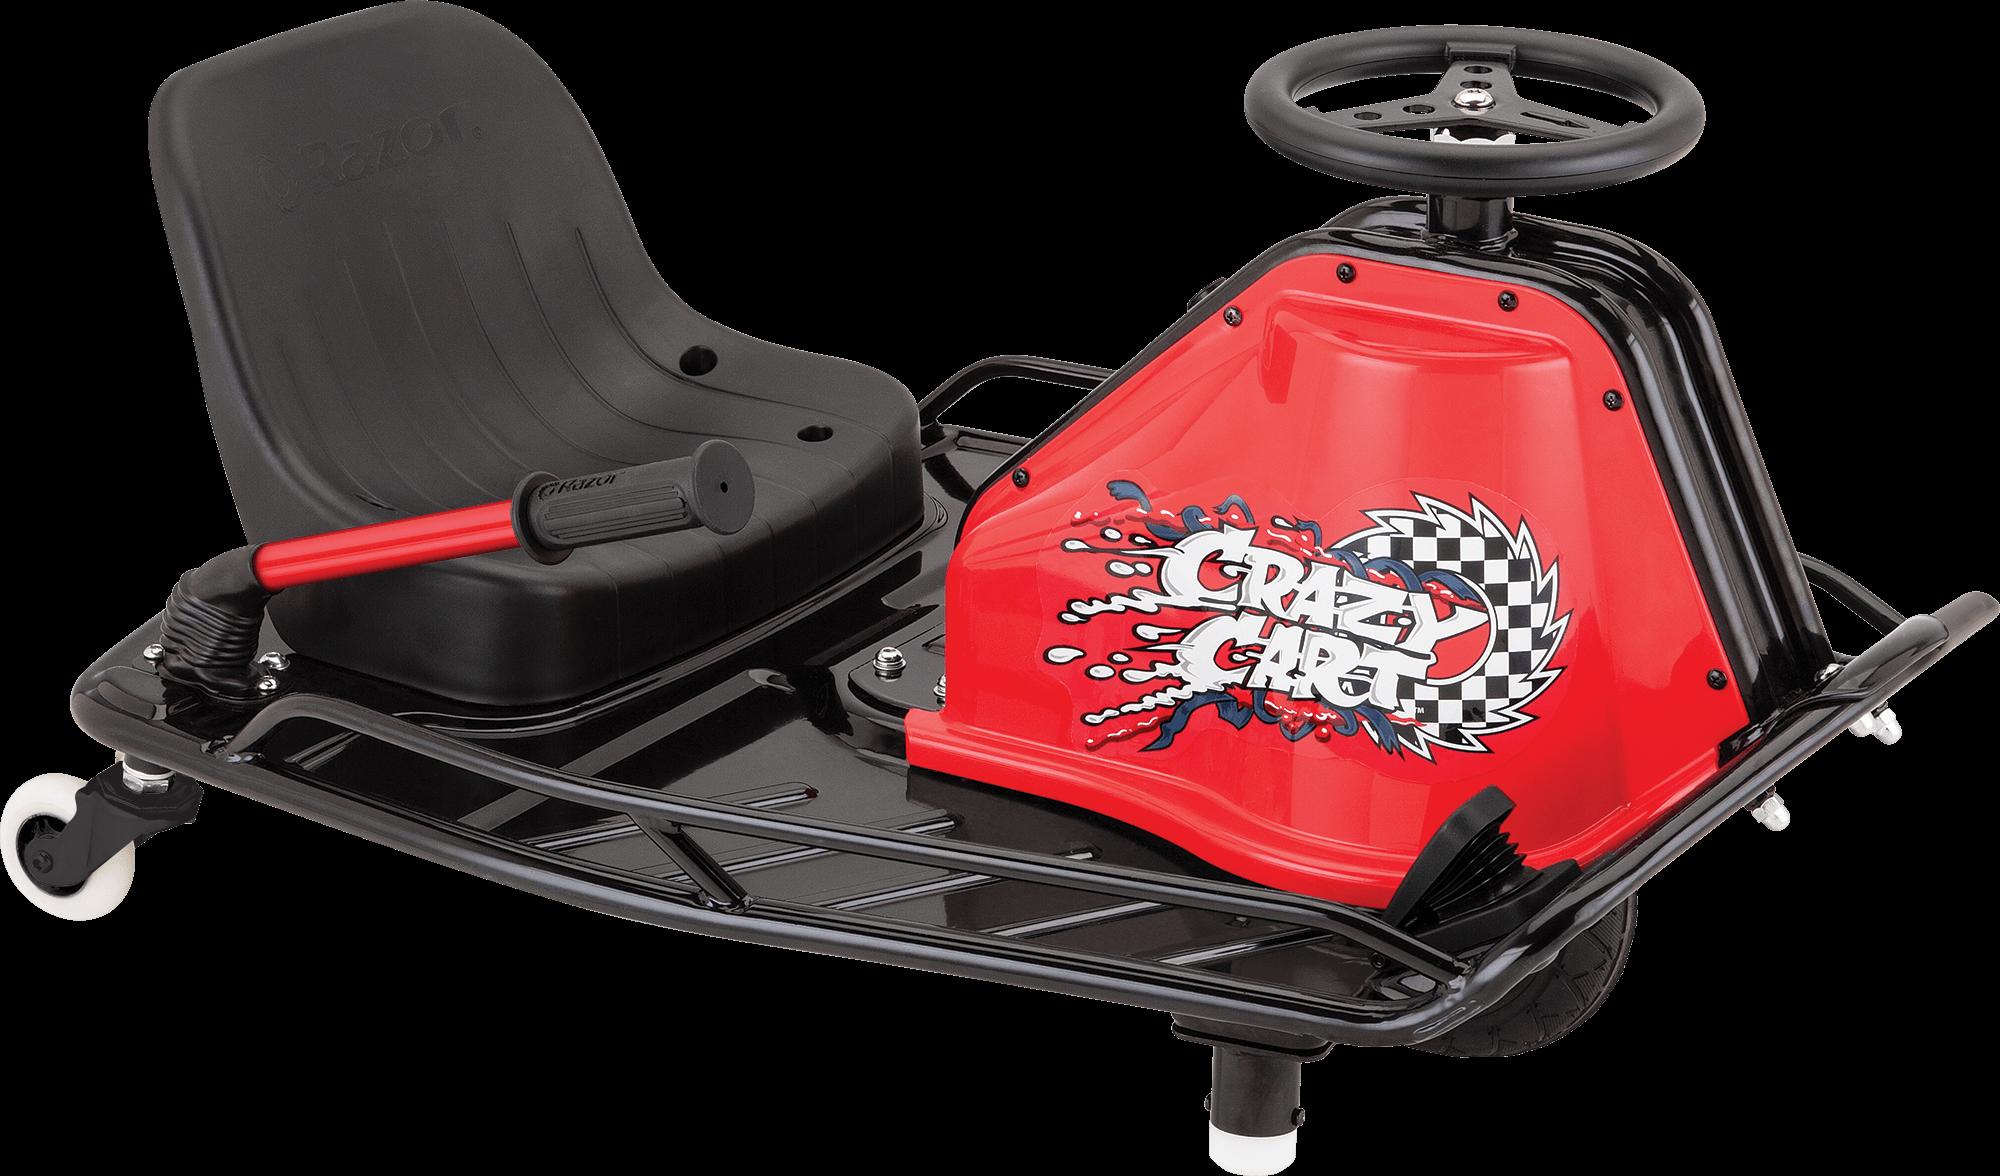 Jr. Scooter Videos Go kart, Go karts for kids, Cheap